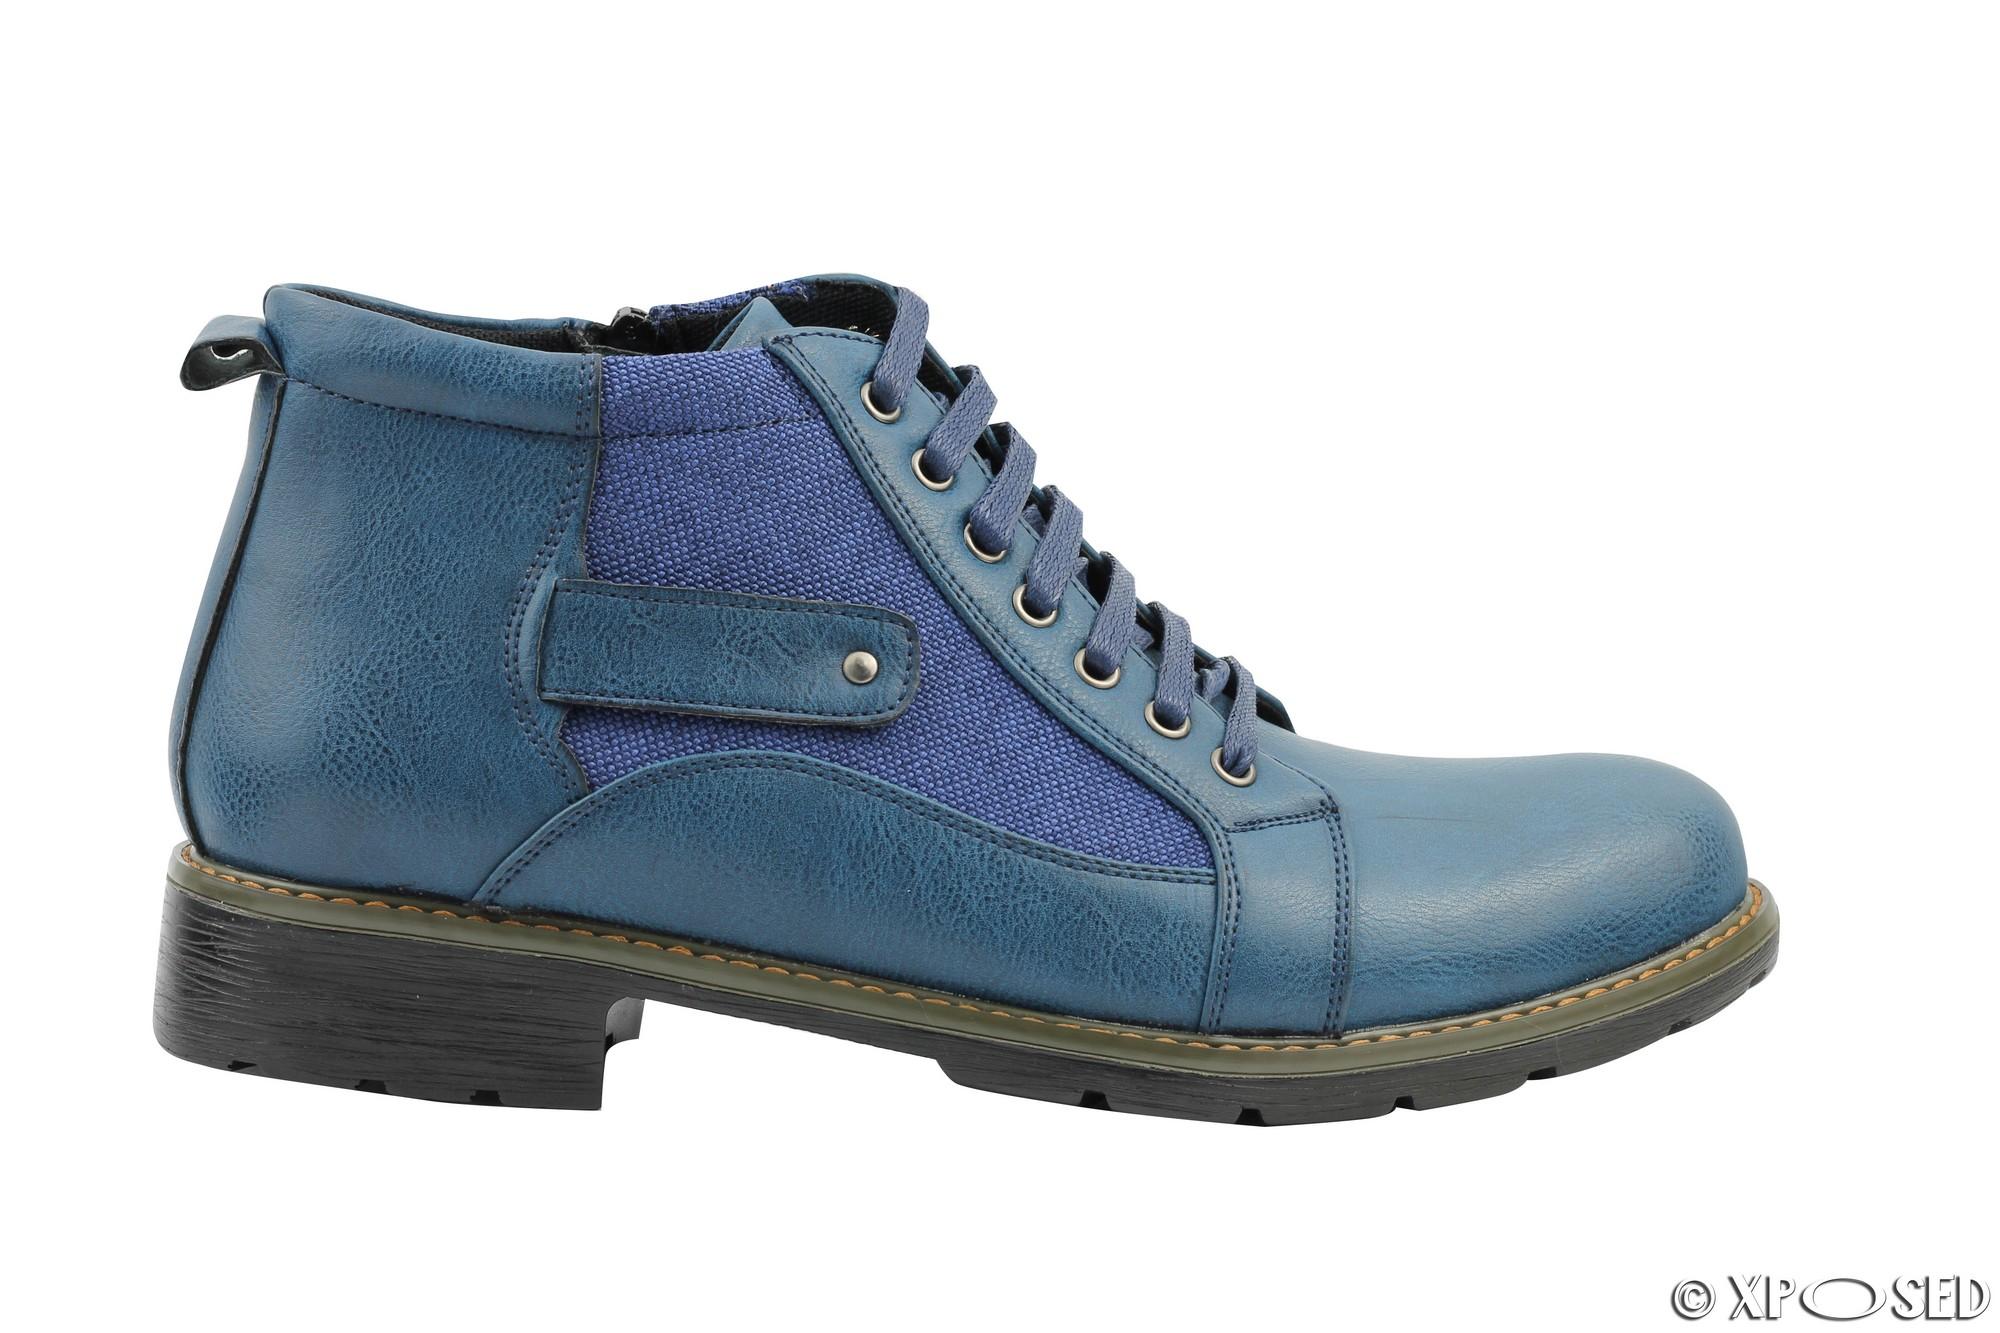 mens faux leather amp canvas boots vintage smart casual lace